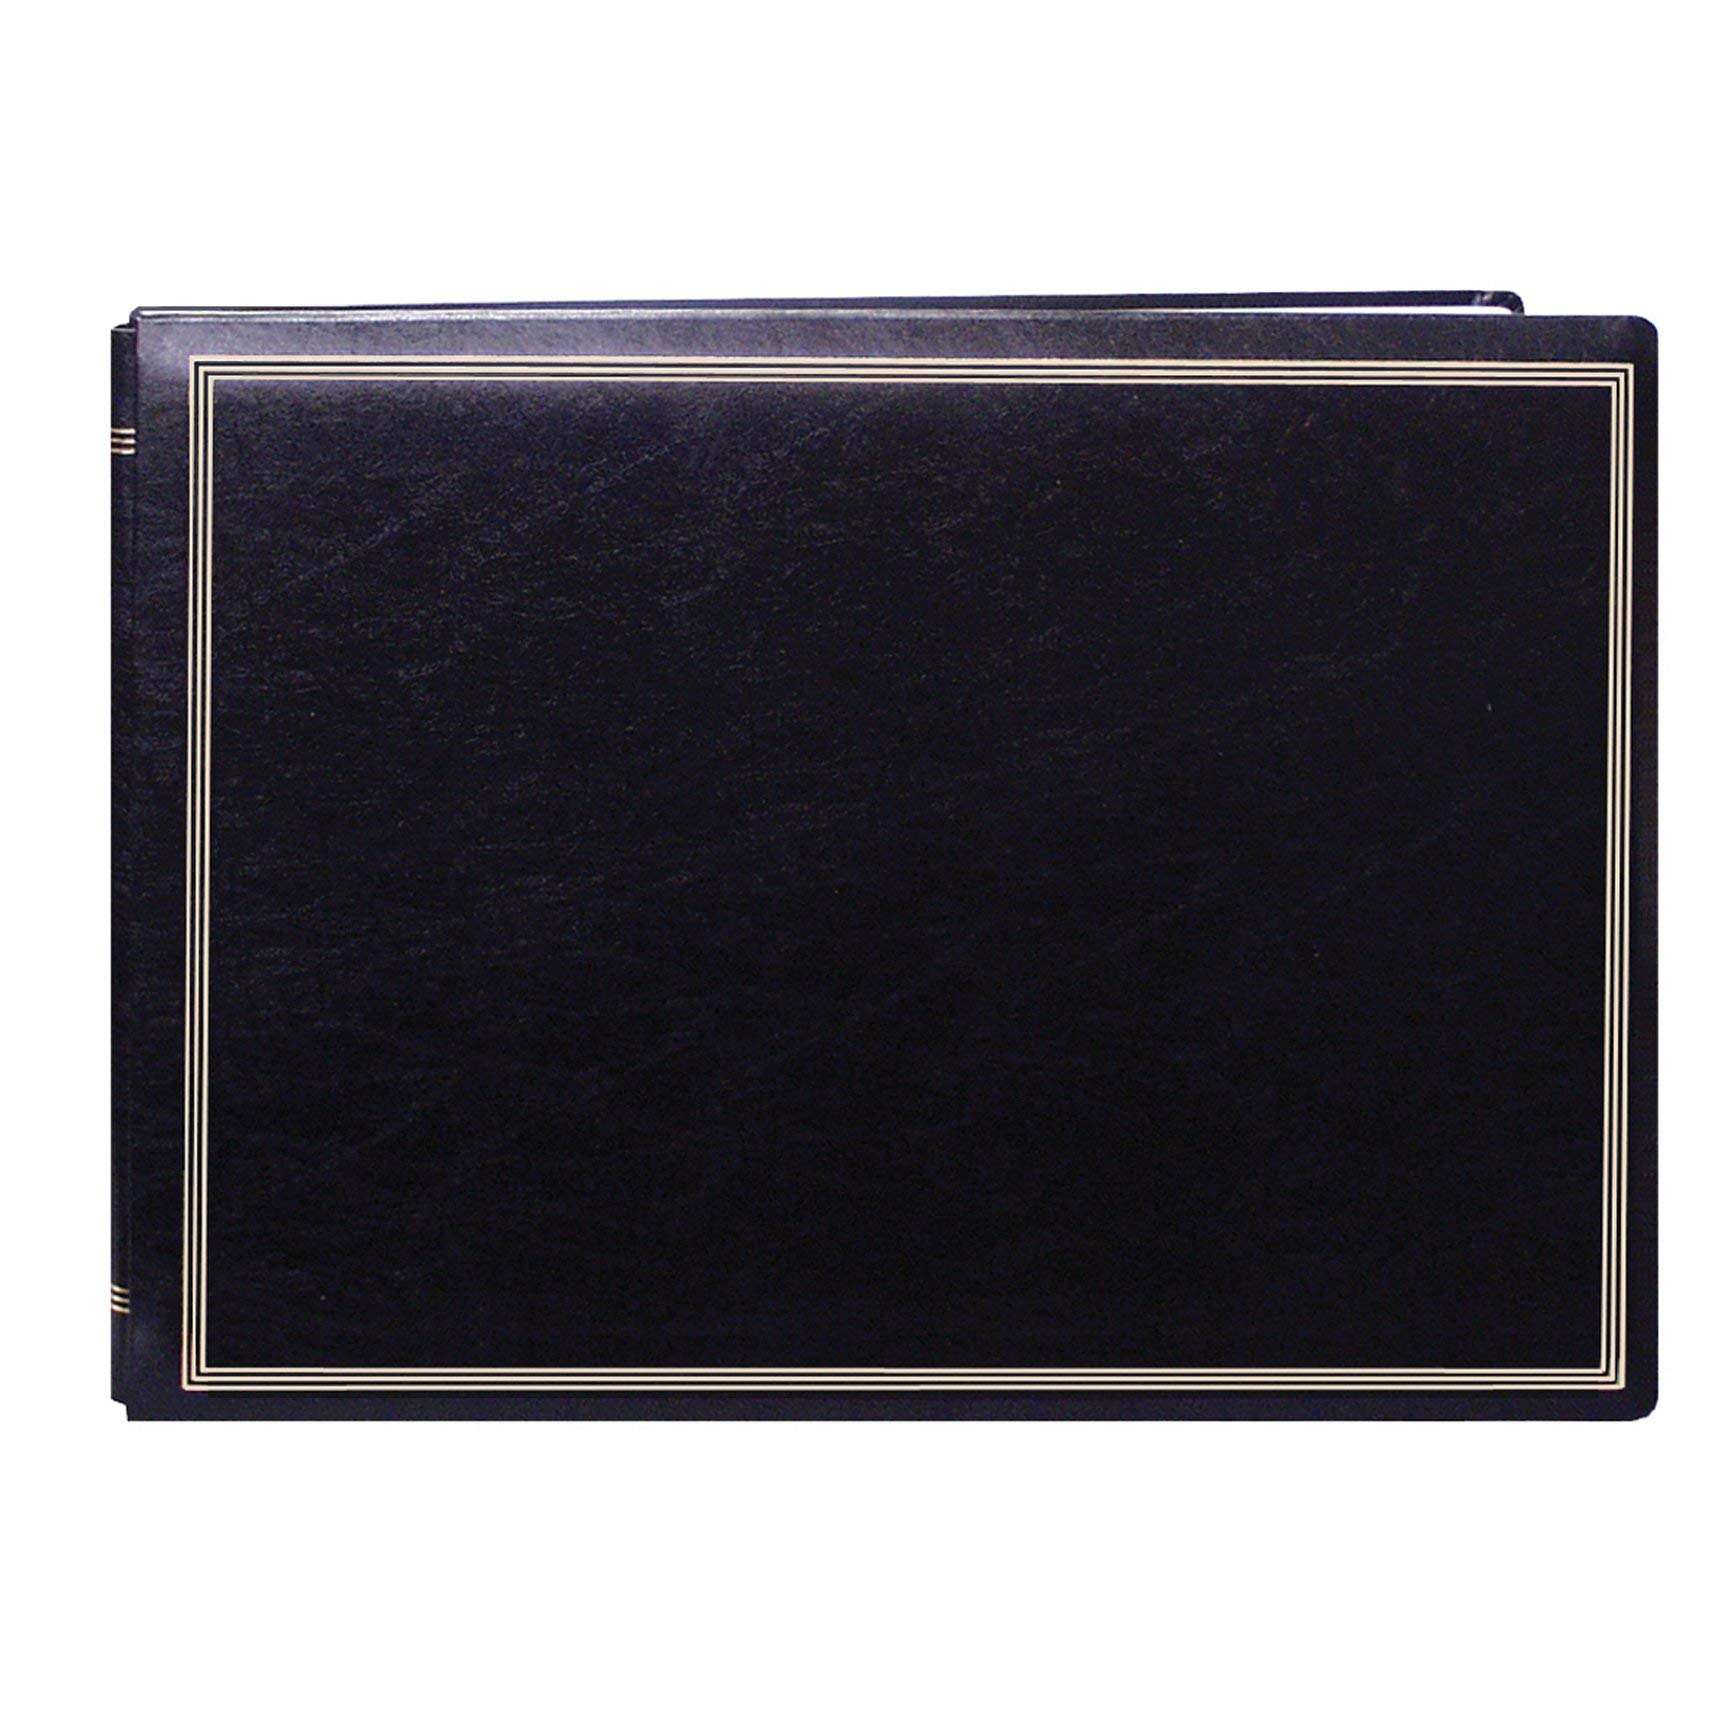 Pioneer Photo Albums Pioneer Leatherette X-Pando Magnetic Album with 2 Bonus Refill Packs by Pioneer Photo Albums (Image #2)